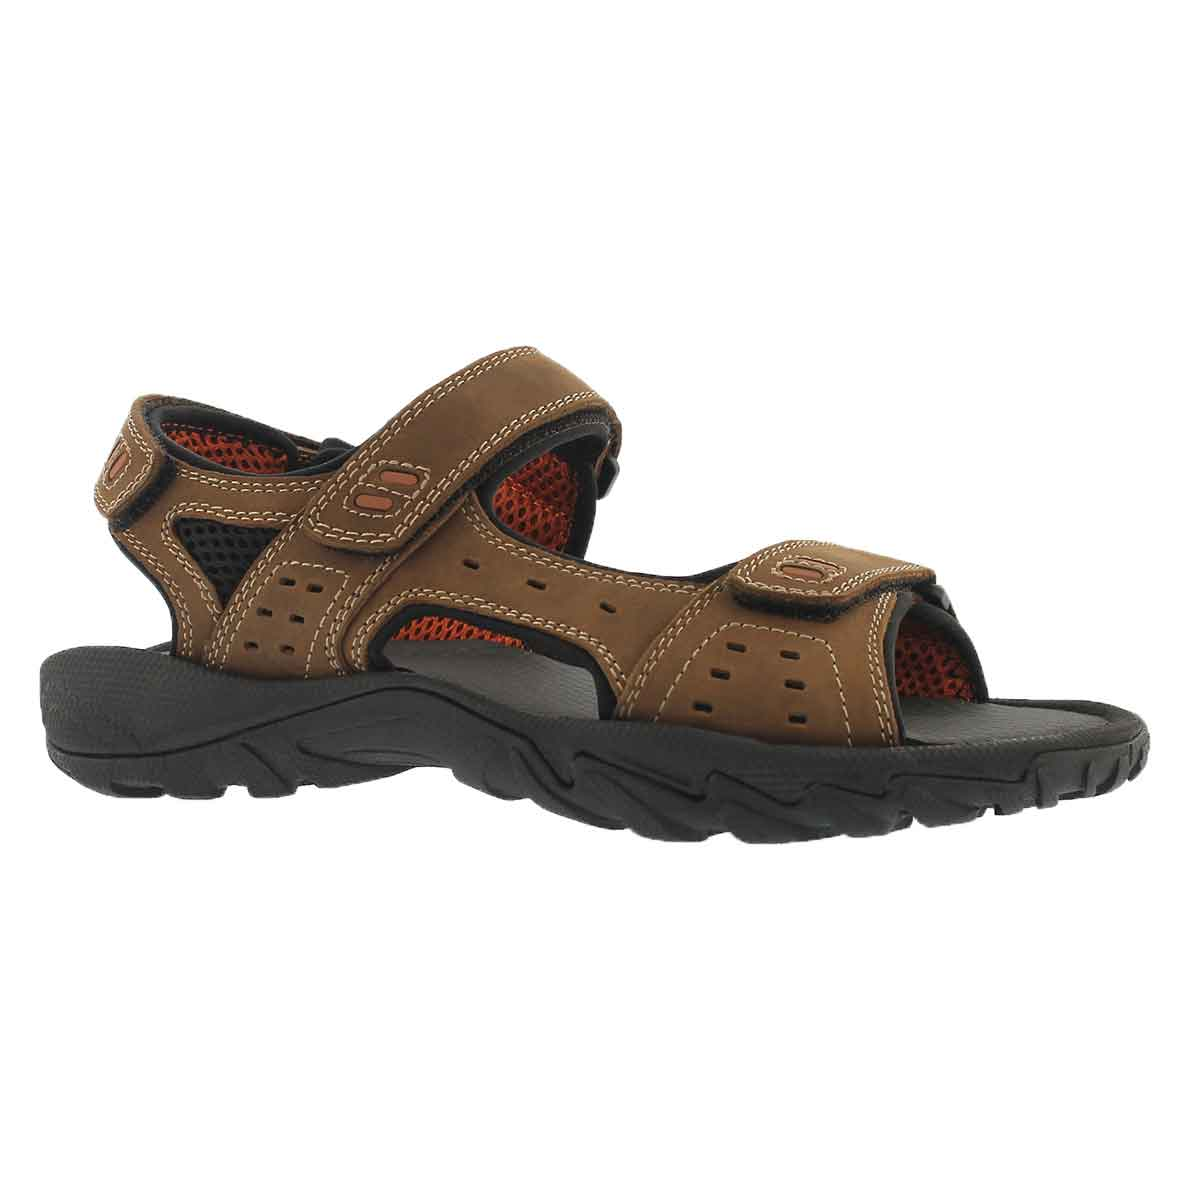 Men's LUCIUS 3 brown 3 strap sport sandals